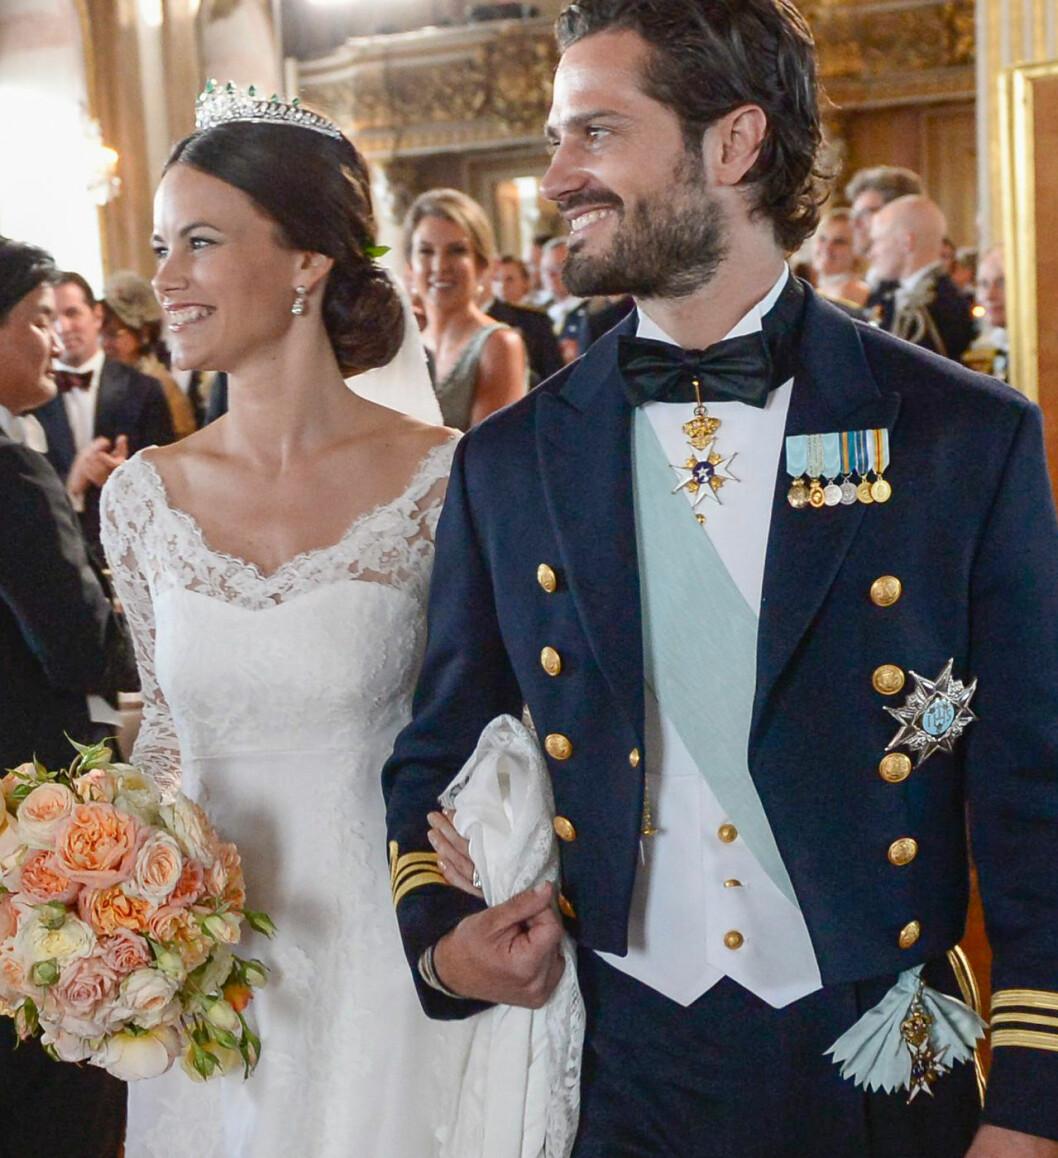 Prinsessan Sofia prins Carl Philip bröllopet 2015